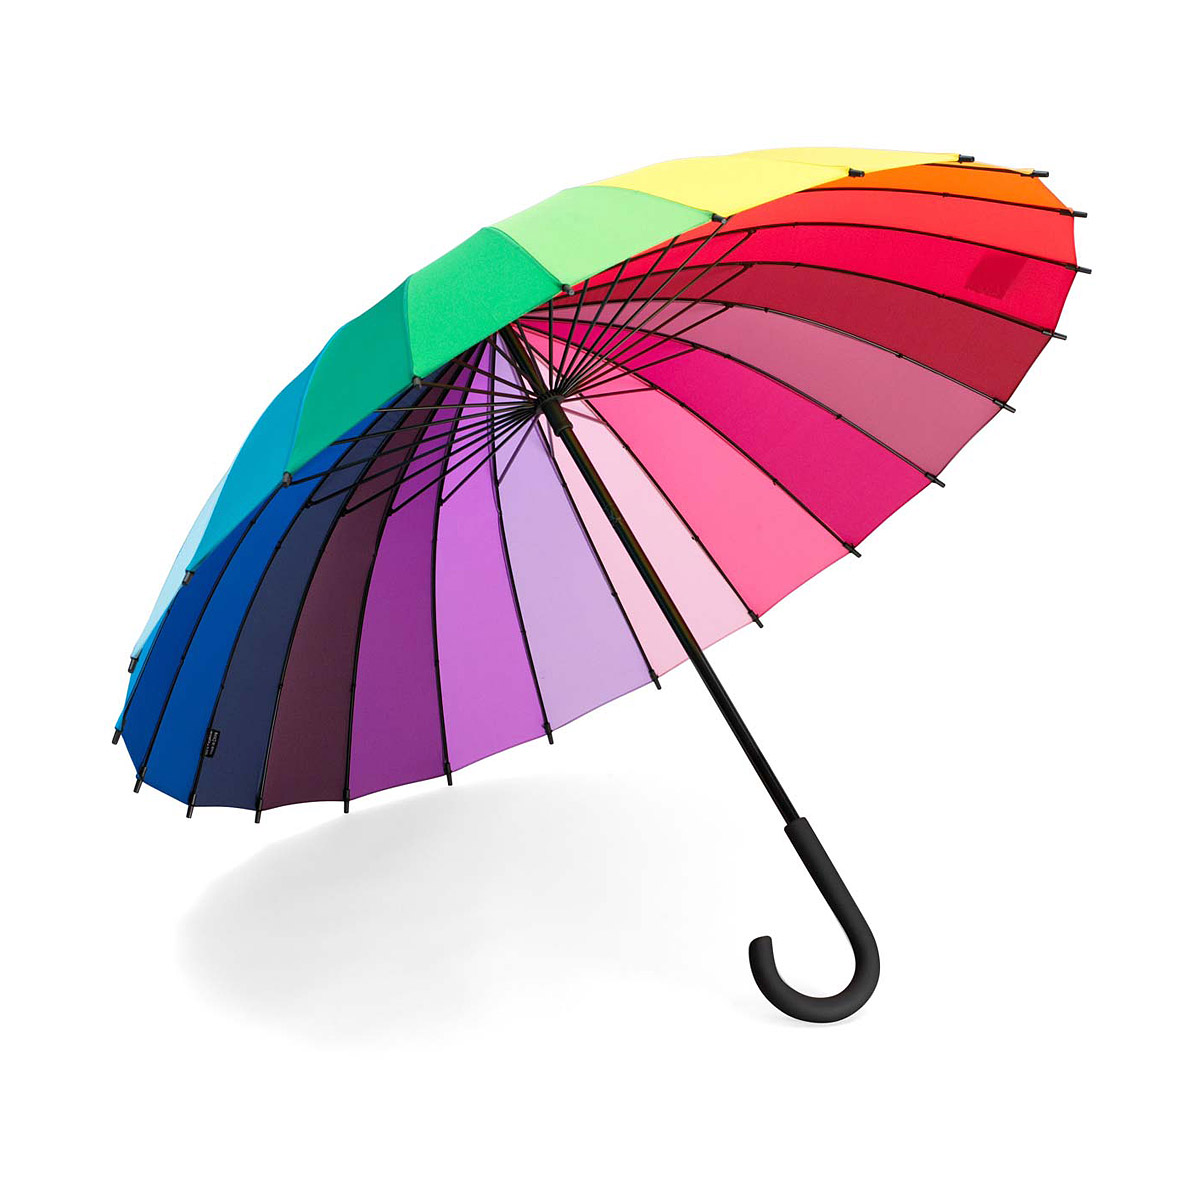 1200x1200 Photography Umbrella Wallpapers (Desktop, Phone, Tablet)